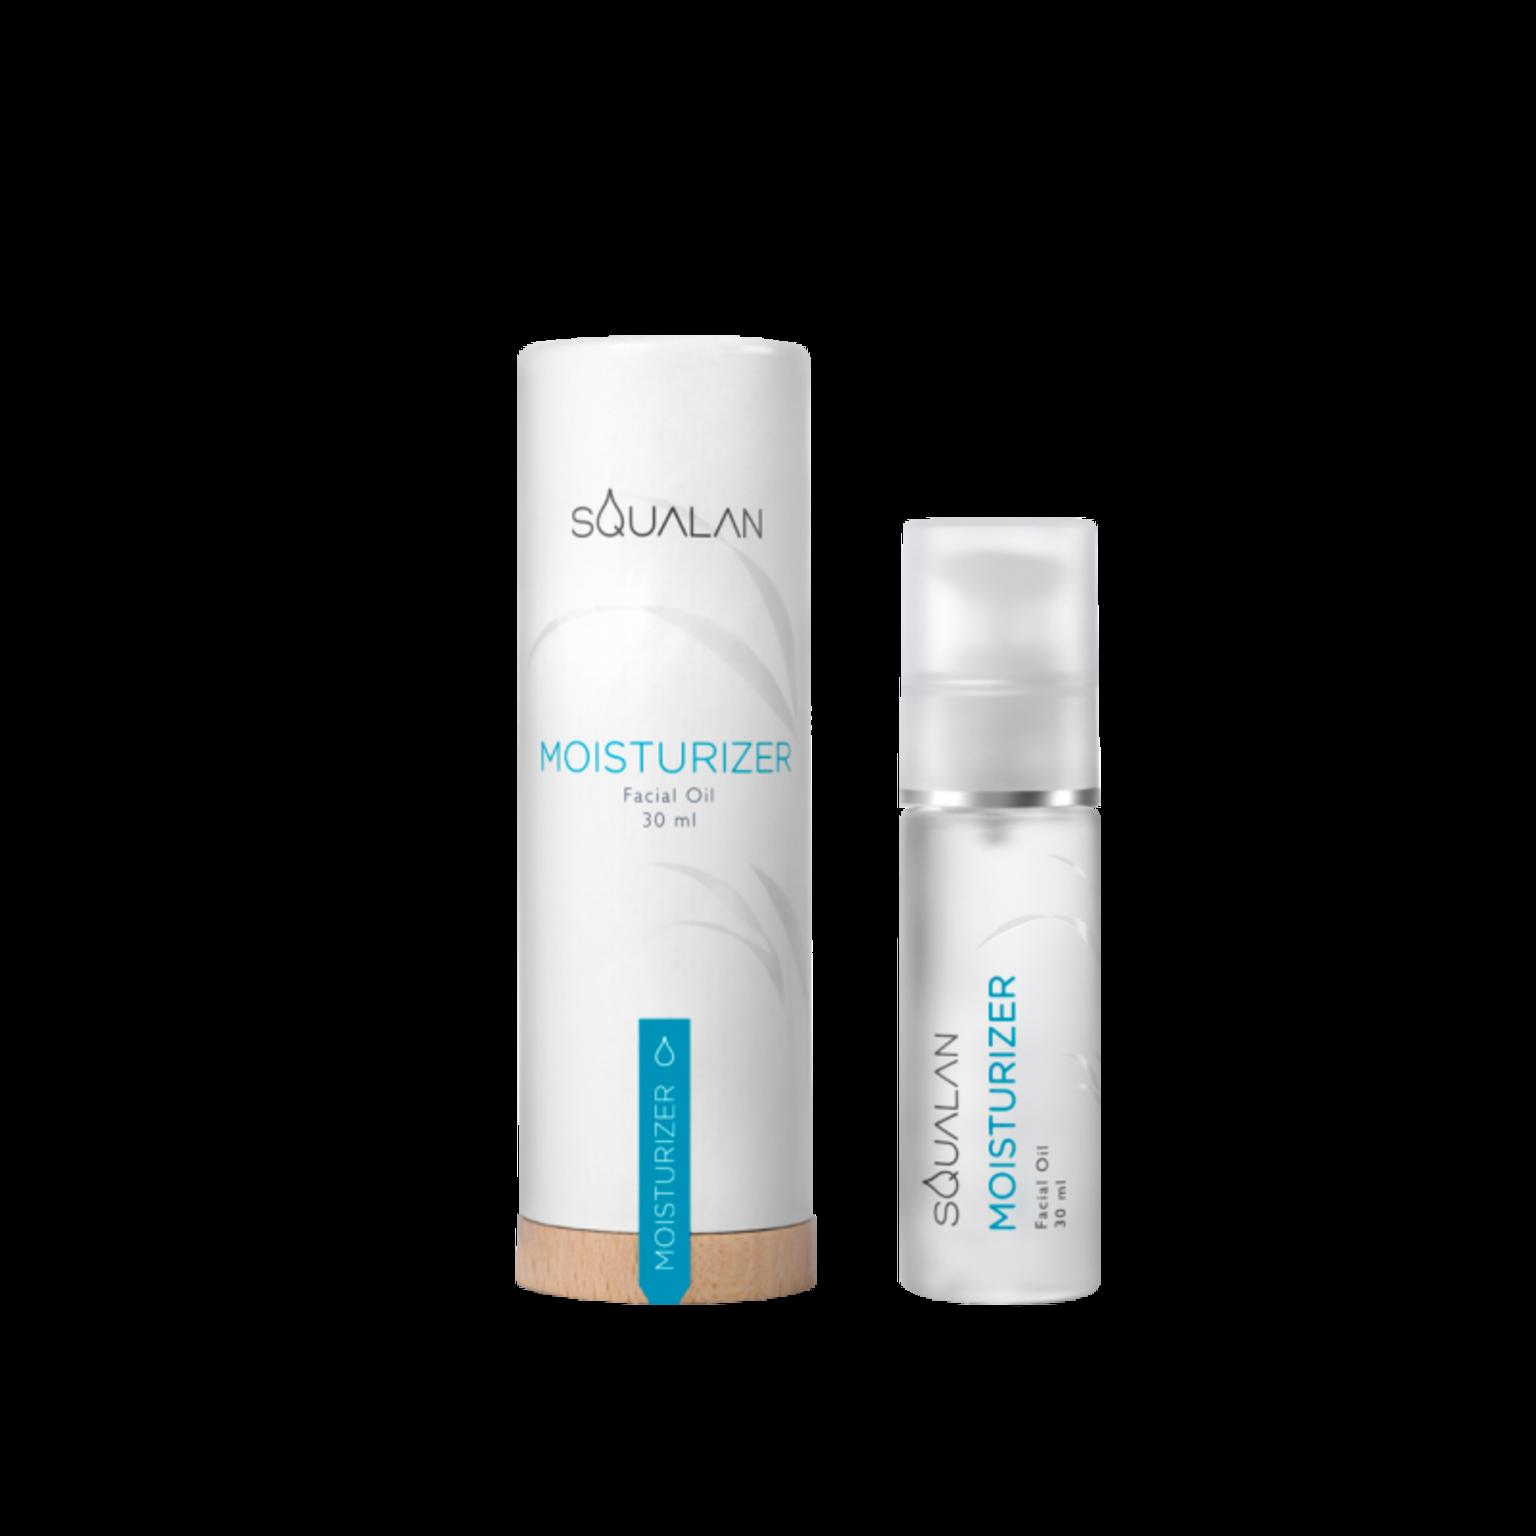 Squalan Moisturizer Treatment 30ml